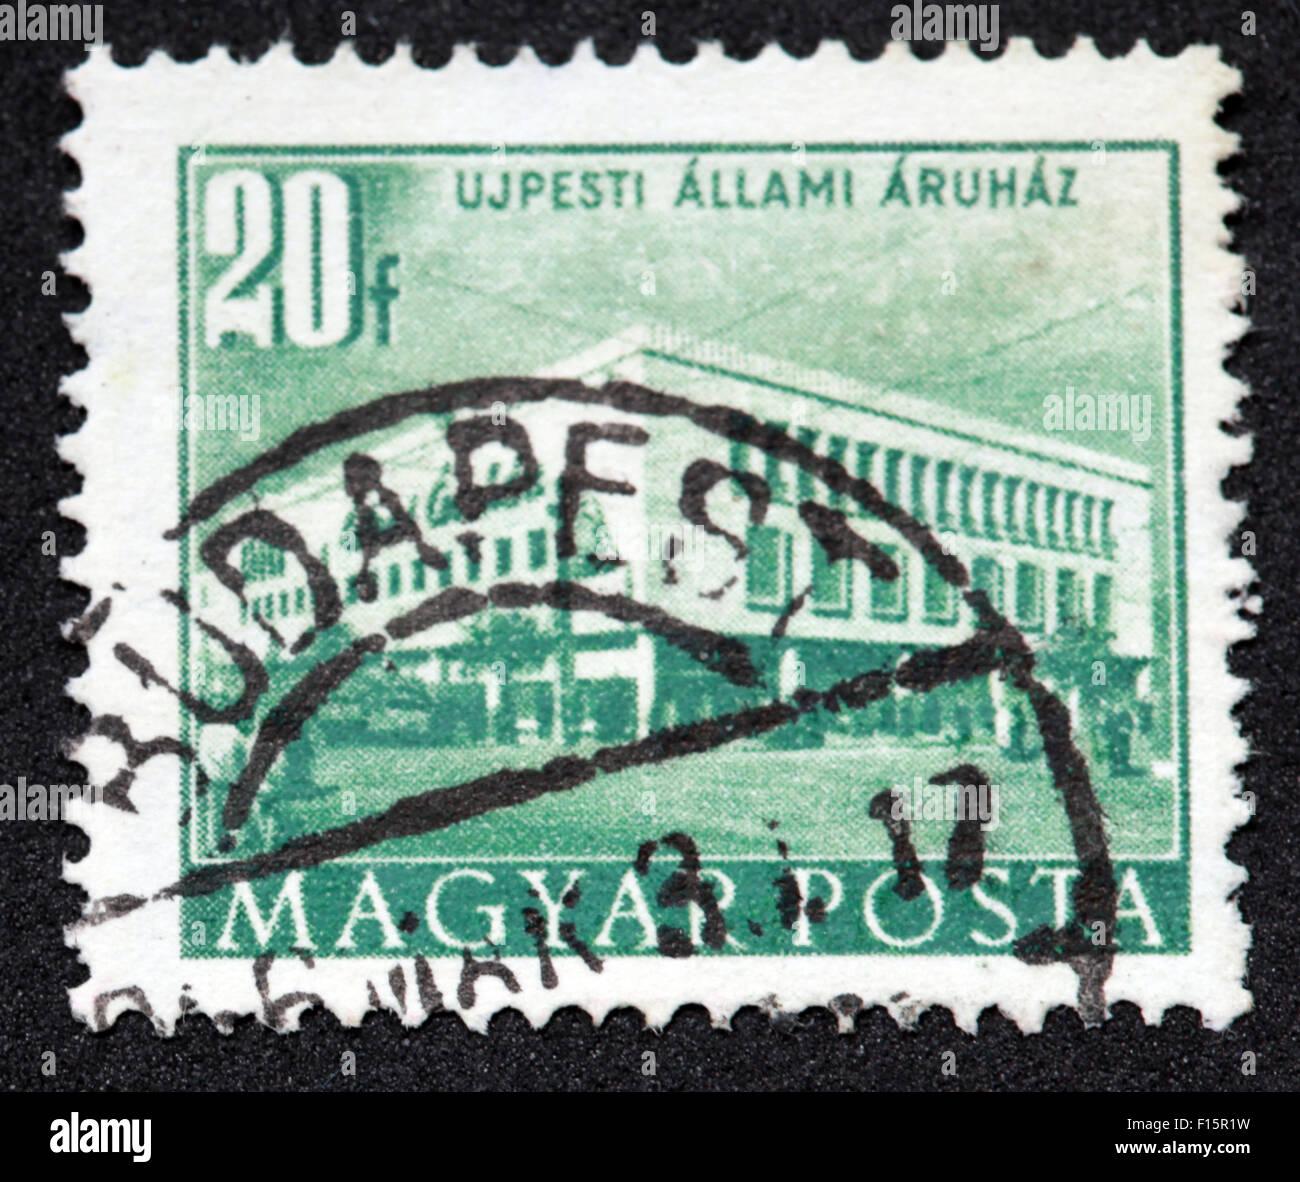 Magyar UjPesti Allami 20f Budapest postmark Stamp - Stock Image